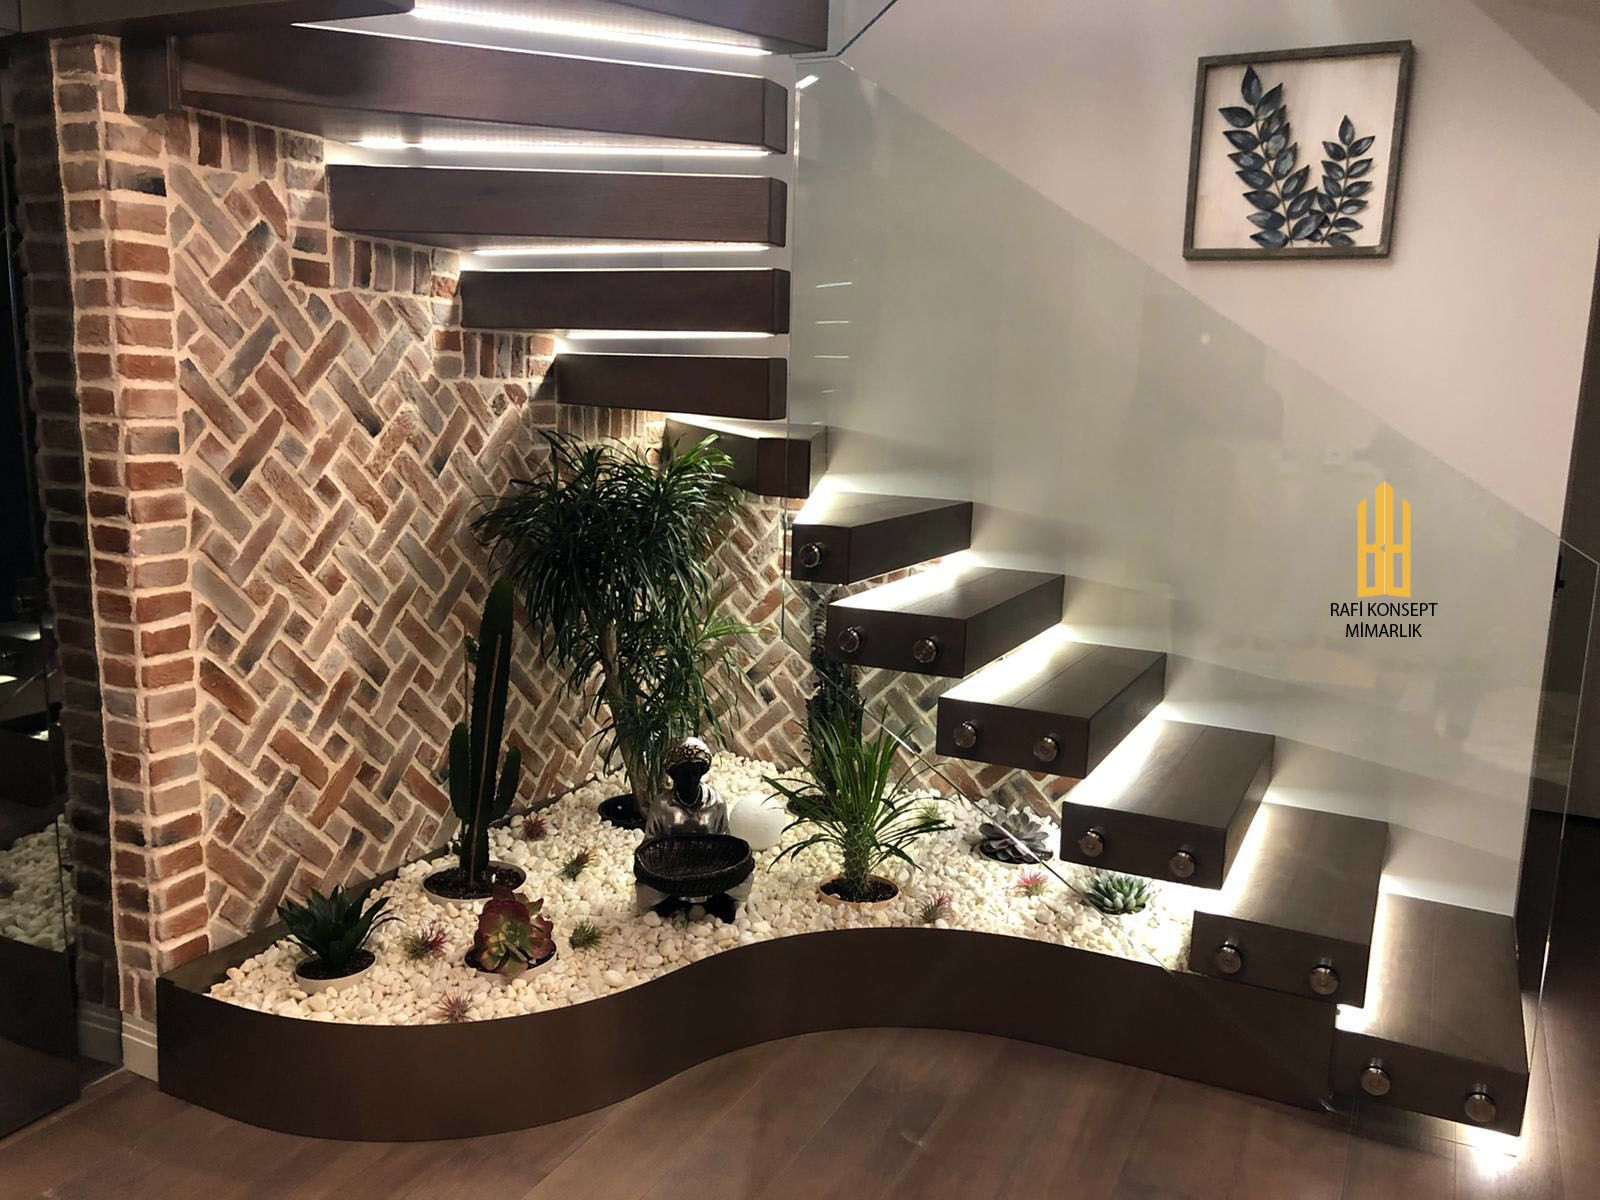 Indoor Plants Decor Ideas Rafi Konsept Mimarlik Ev Tasarim Planlari Ev Icin Tasarim Ic Mekanlar